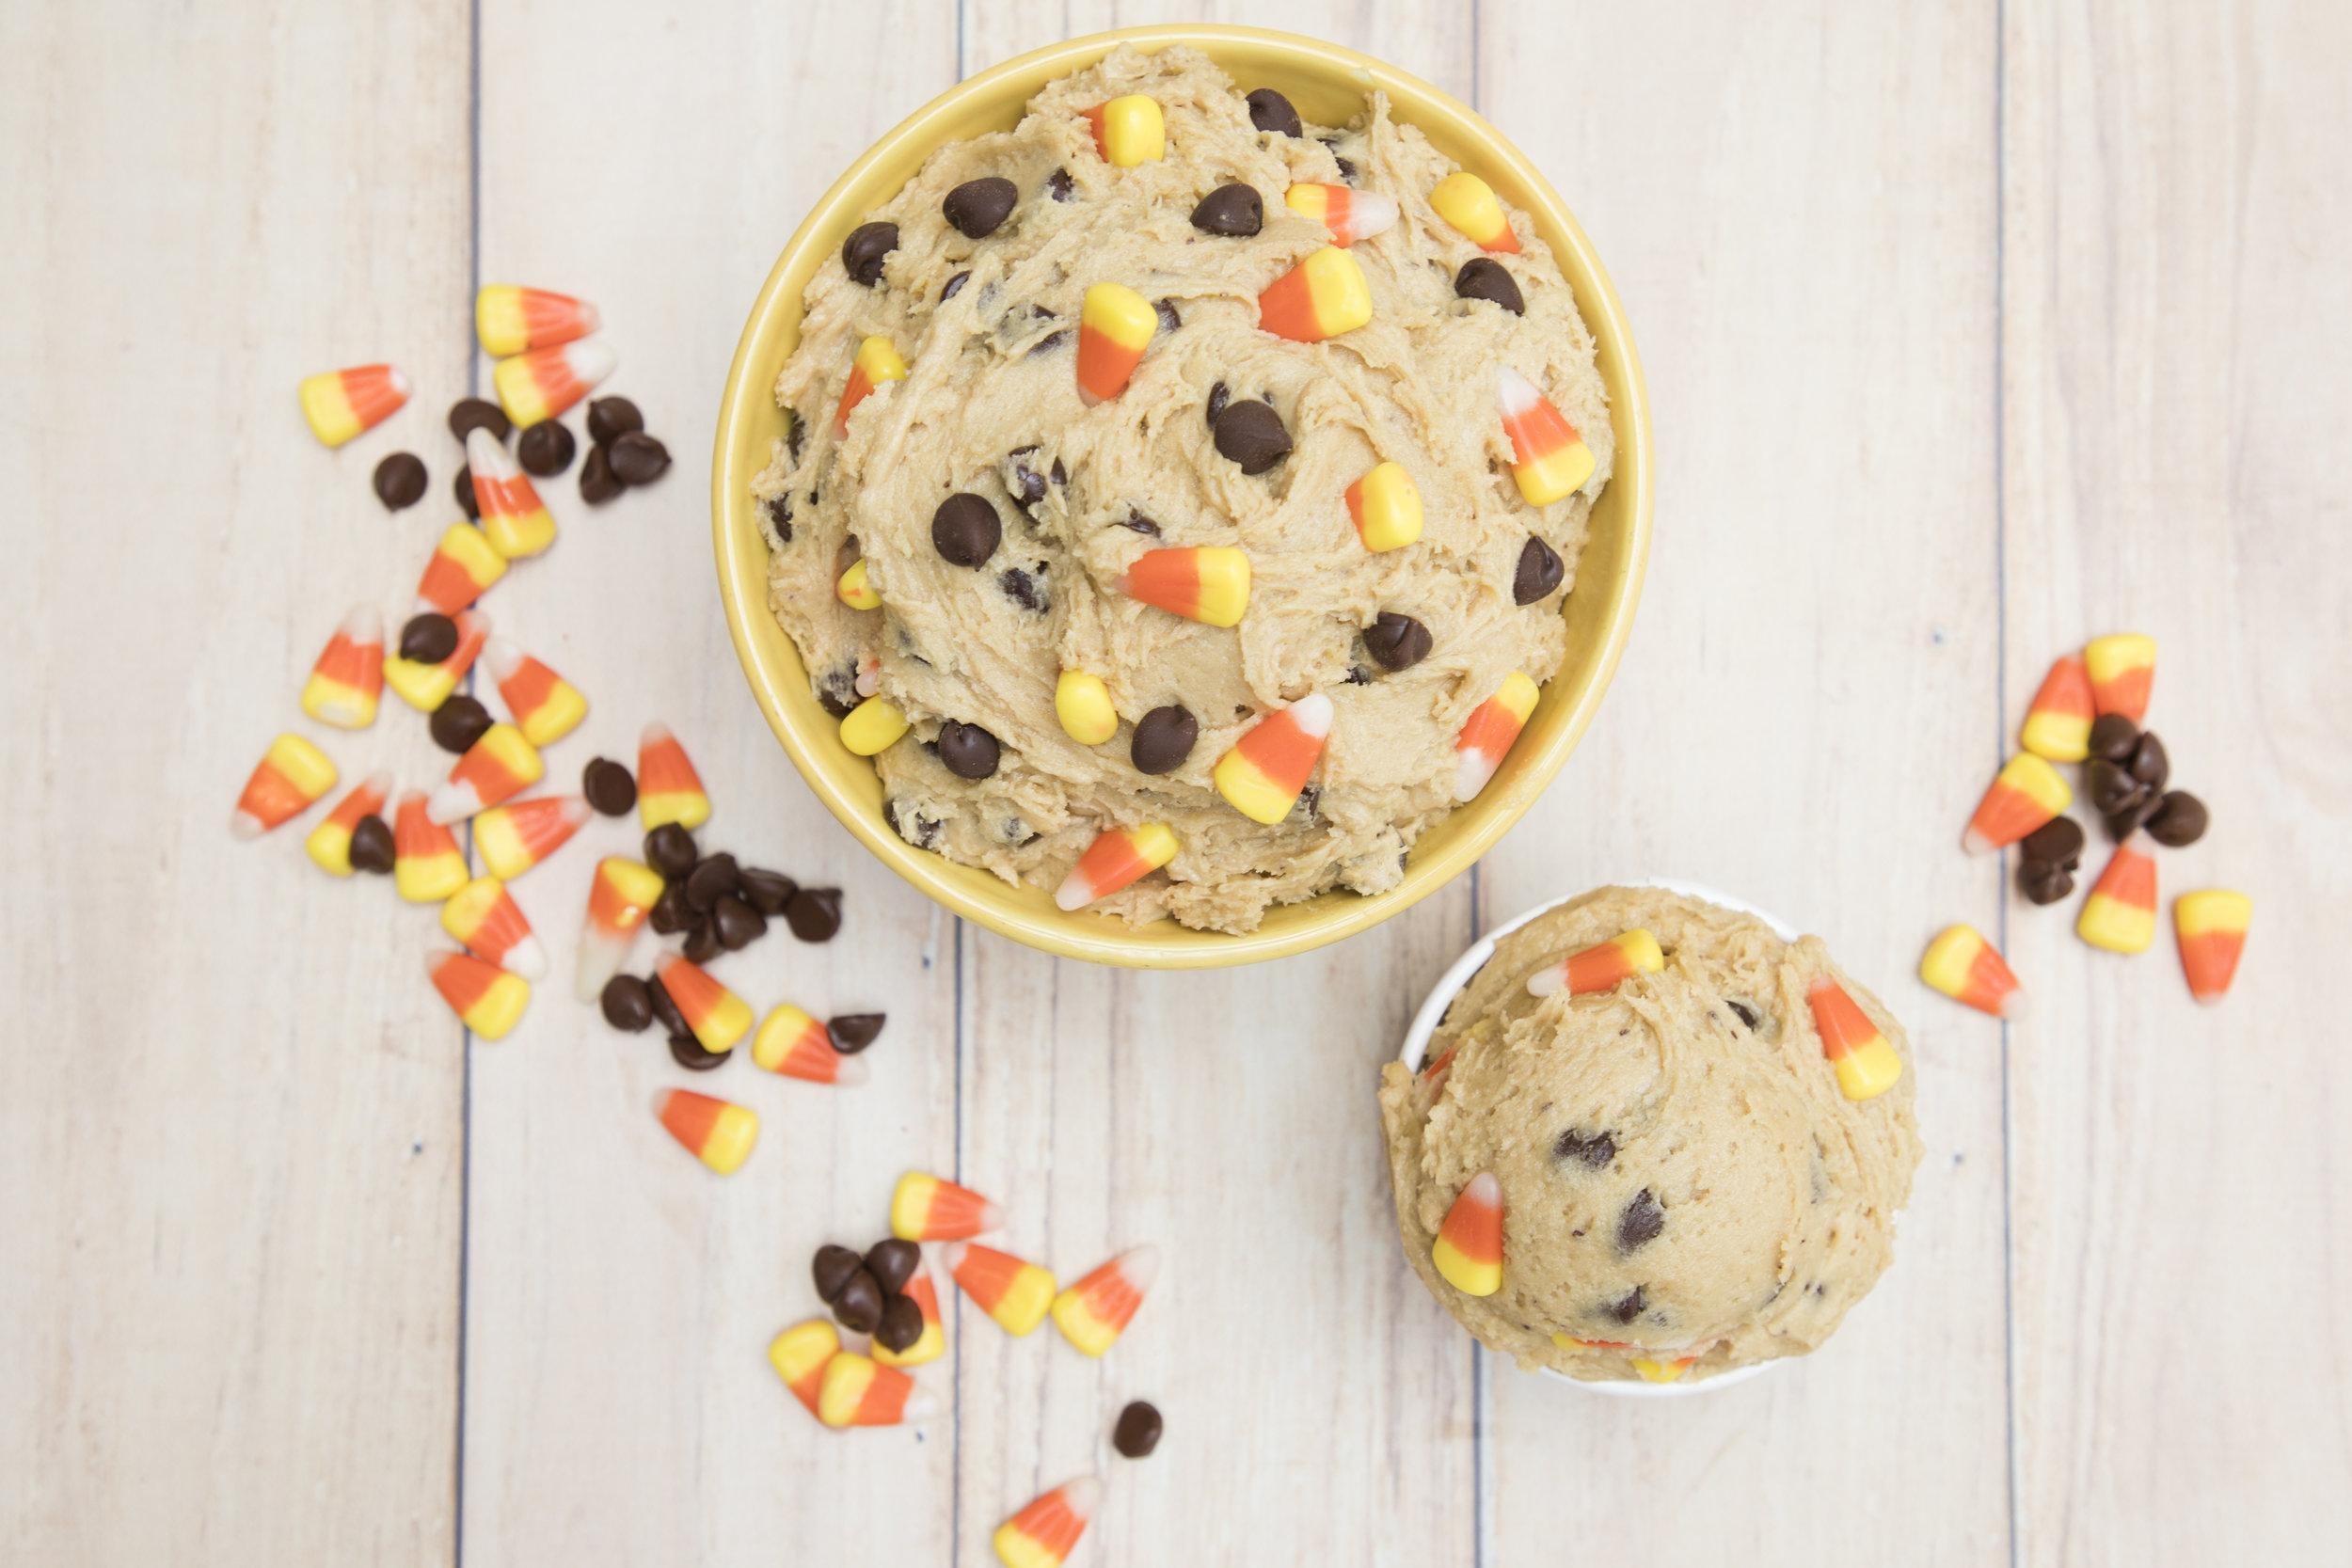 Cookie Dough Confections at Urbanspace at 570 Lex